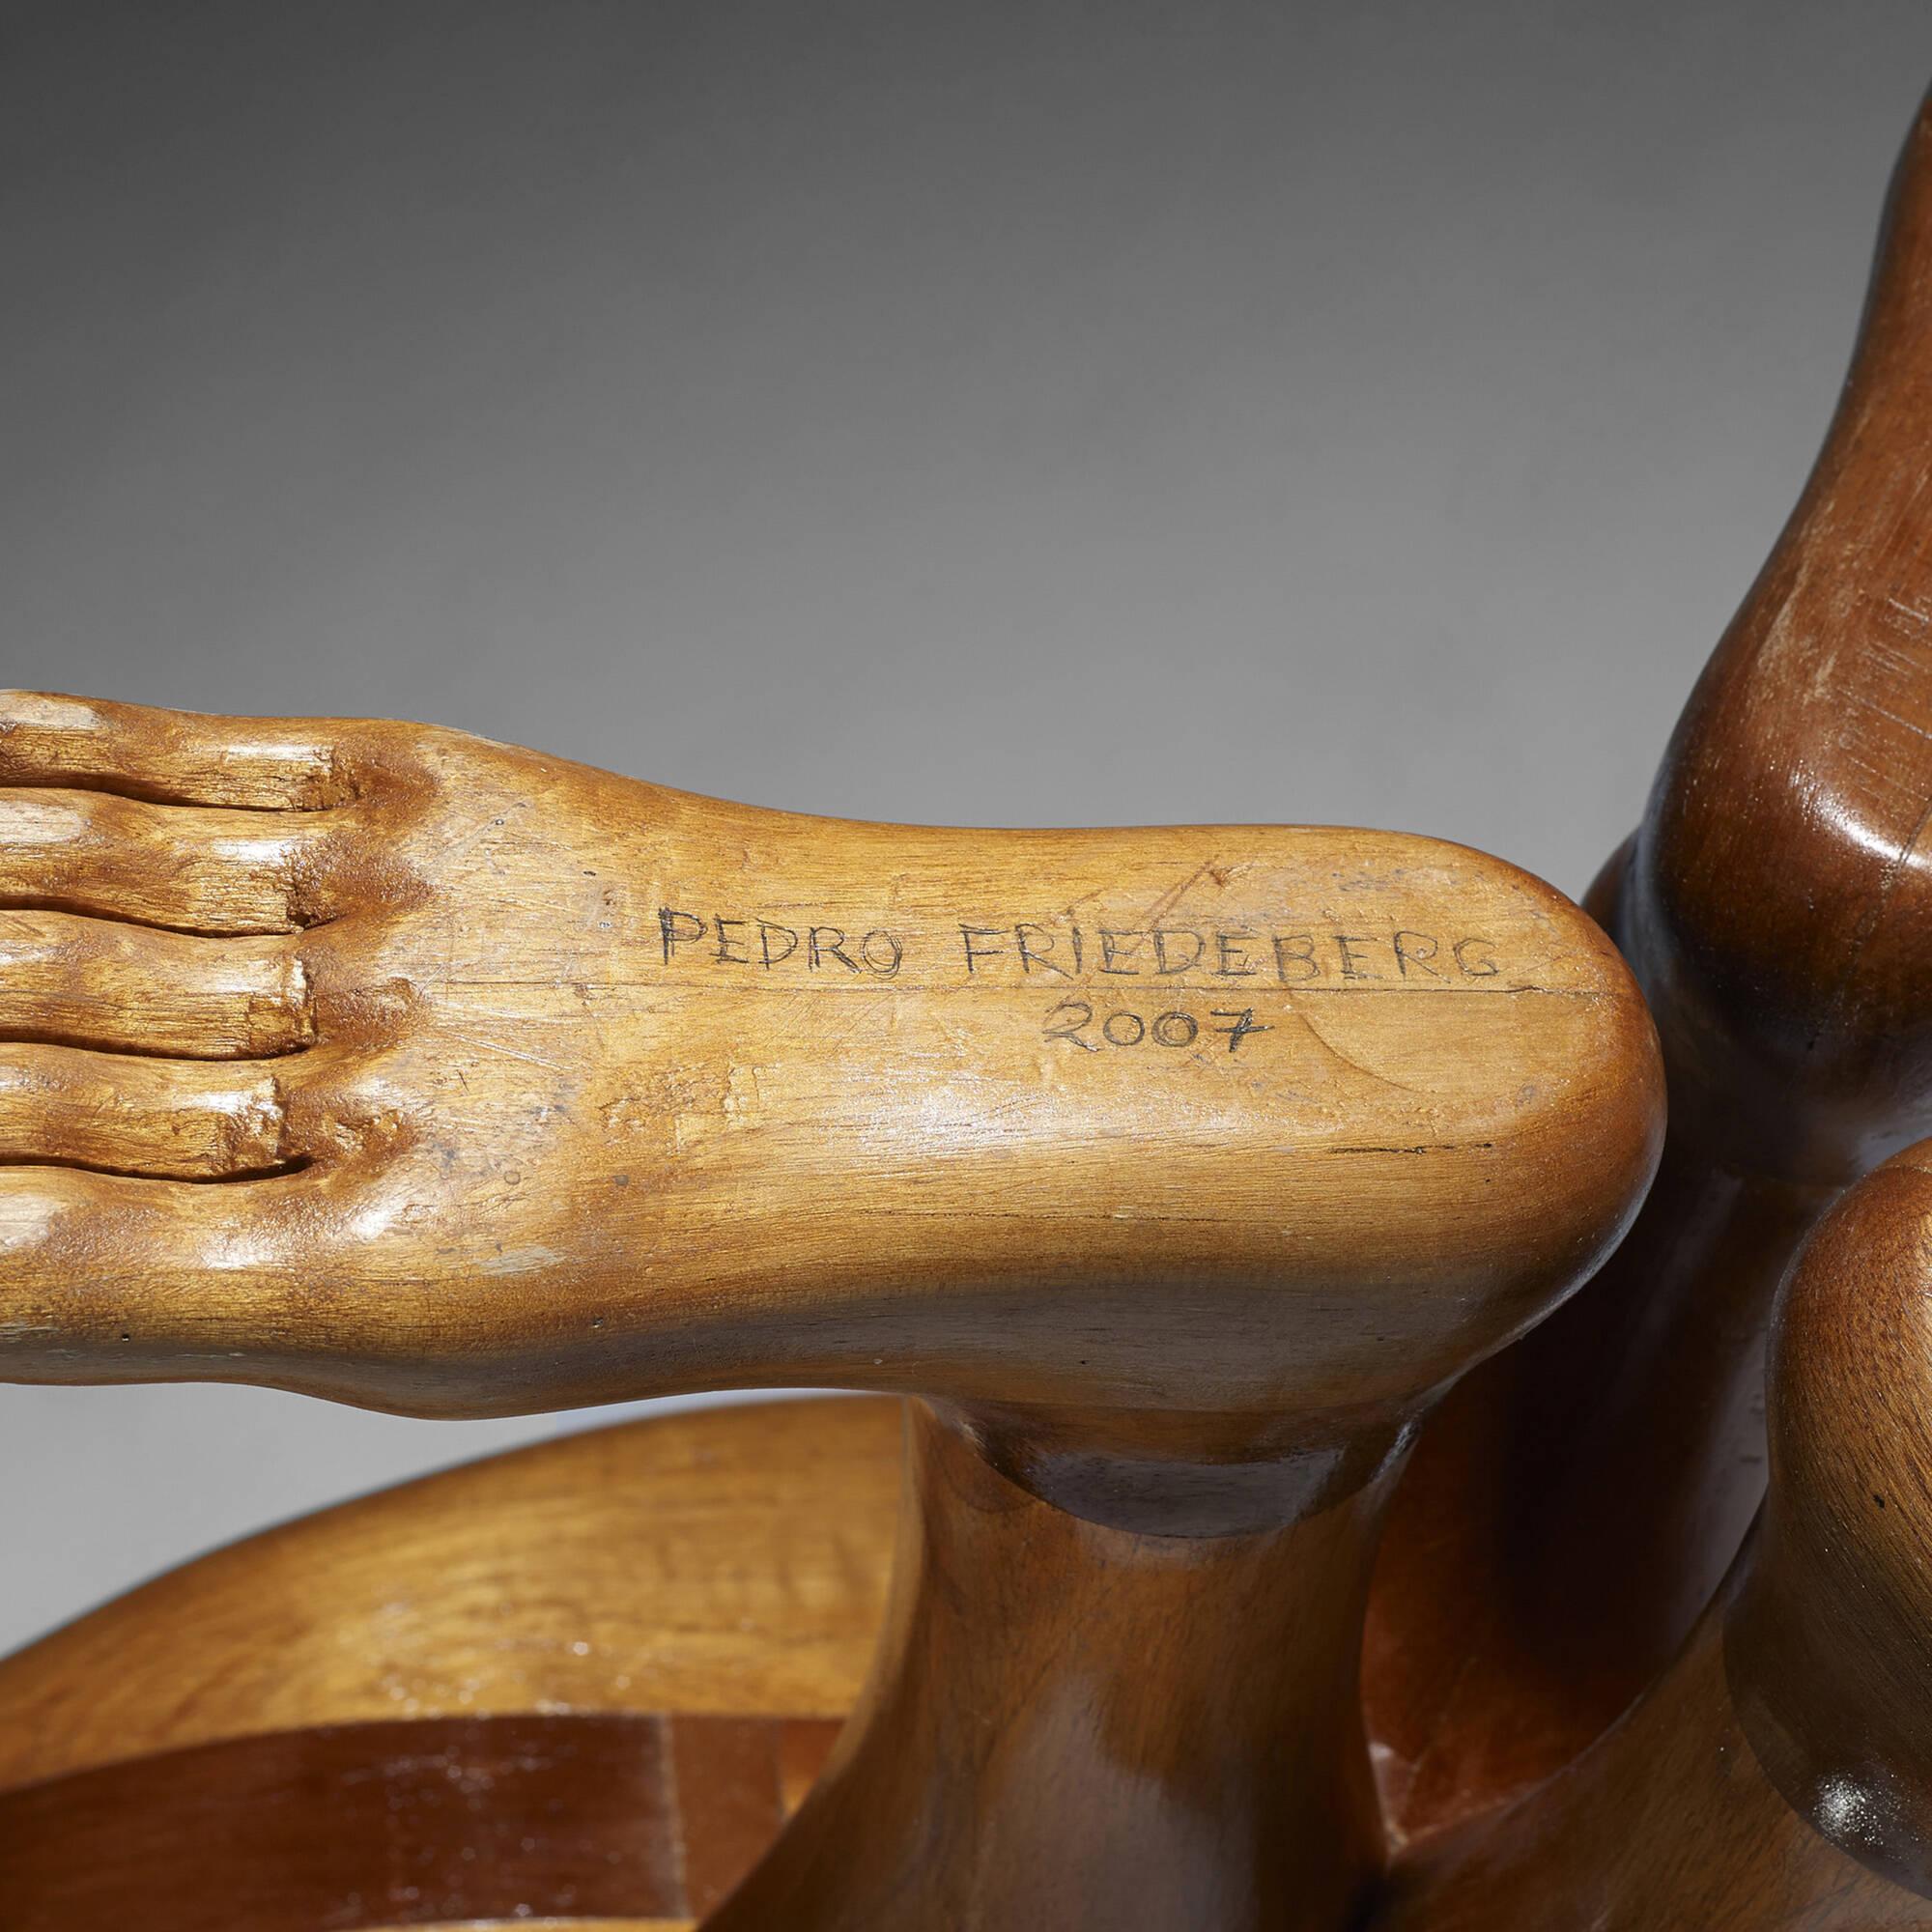 382: PEDRO FRIEDEBERG, Hand-Foot chairs, pair \u003c Design, 12 June ...